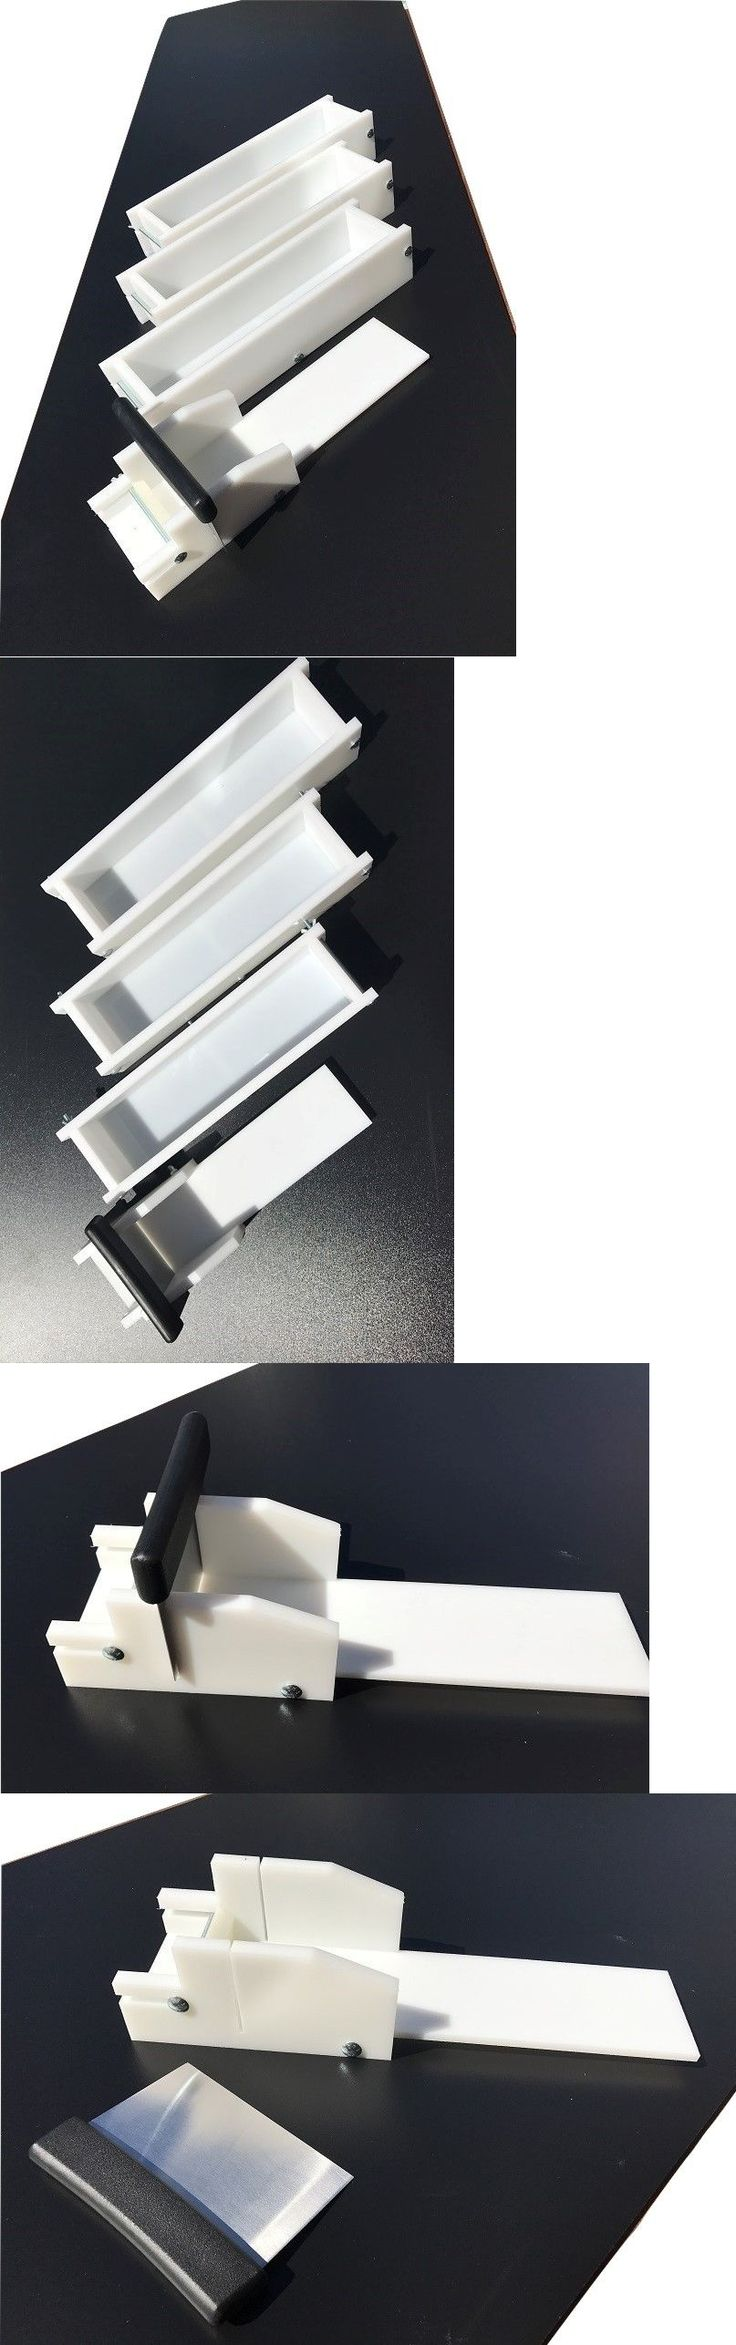 bar soap making process pdf